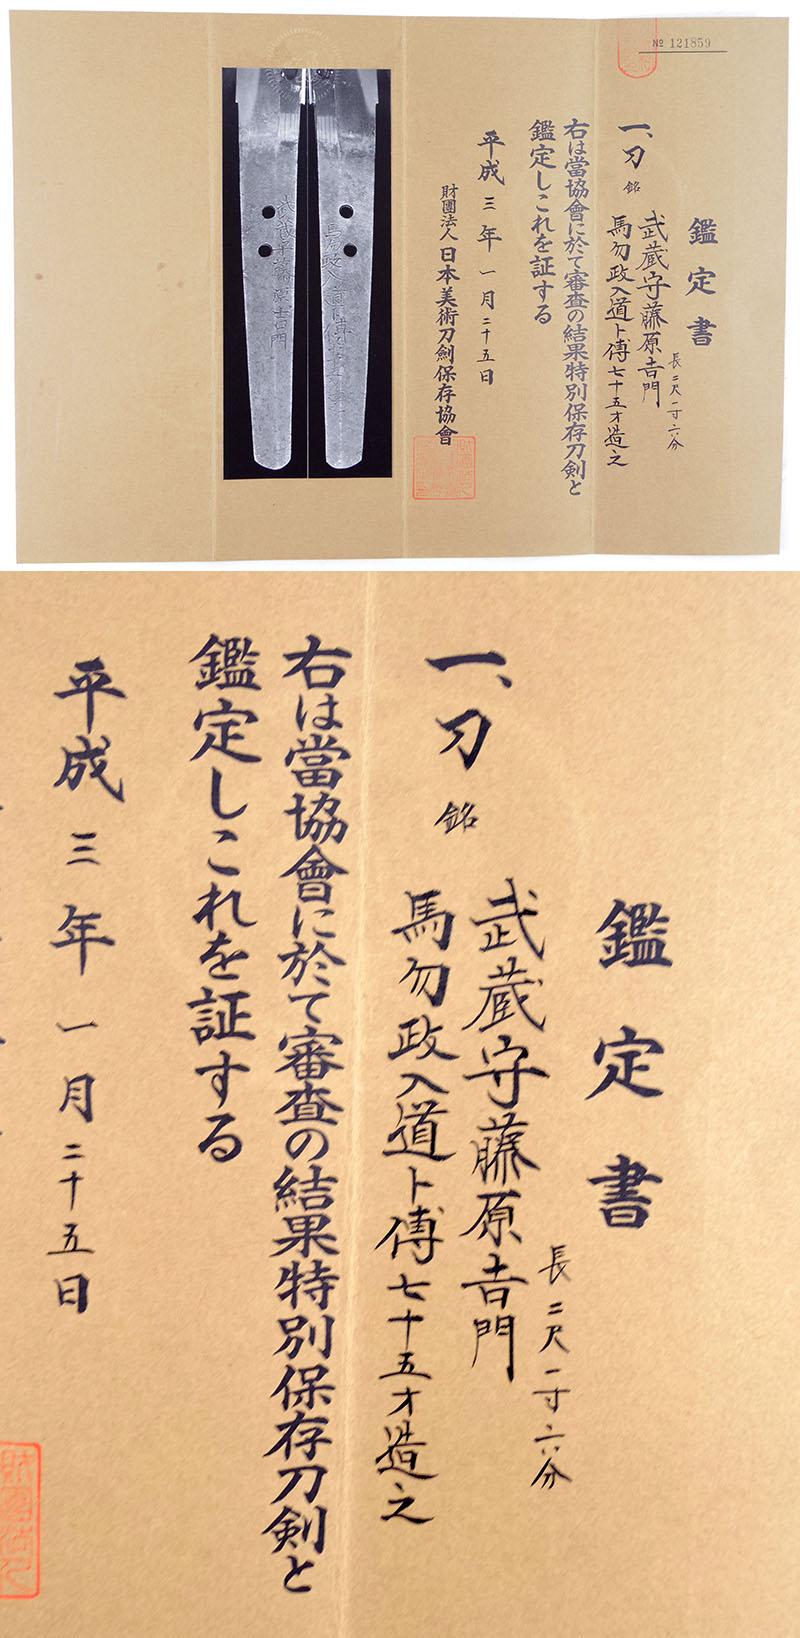 武蔵守藤原吉門 Picture of Certificate